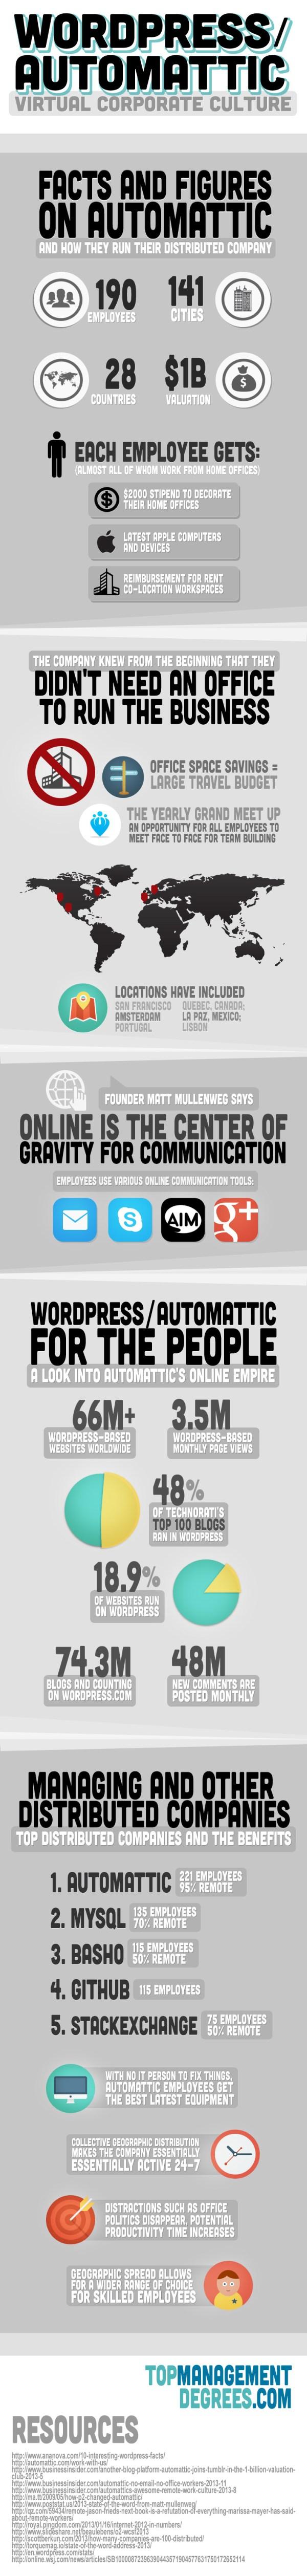 WordPressInfoGraphic